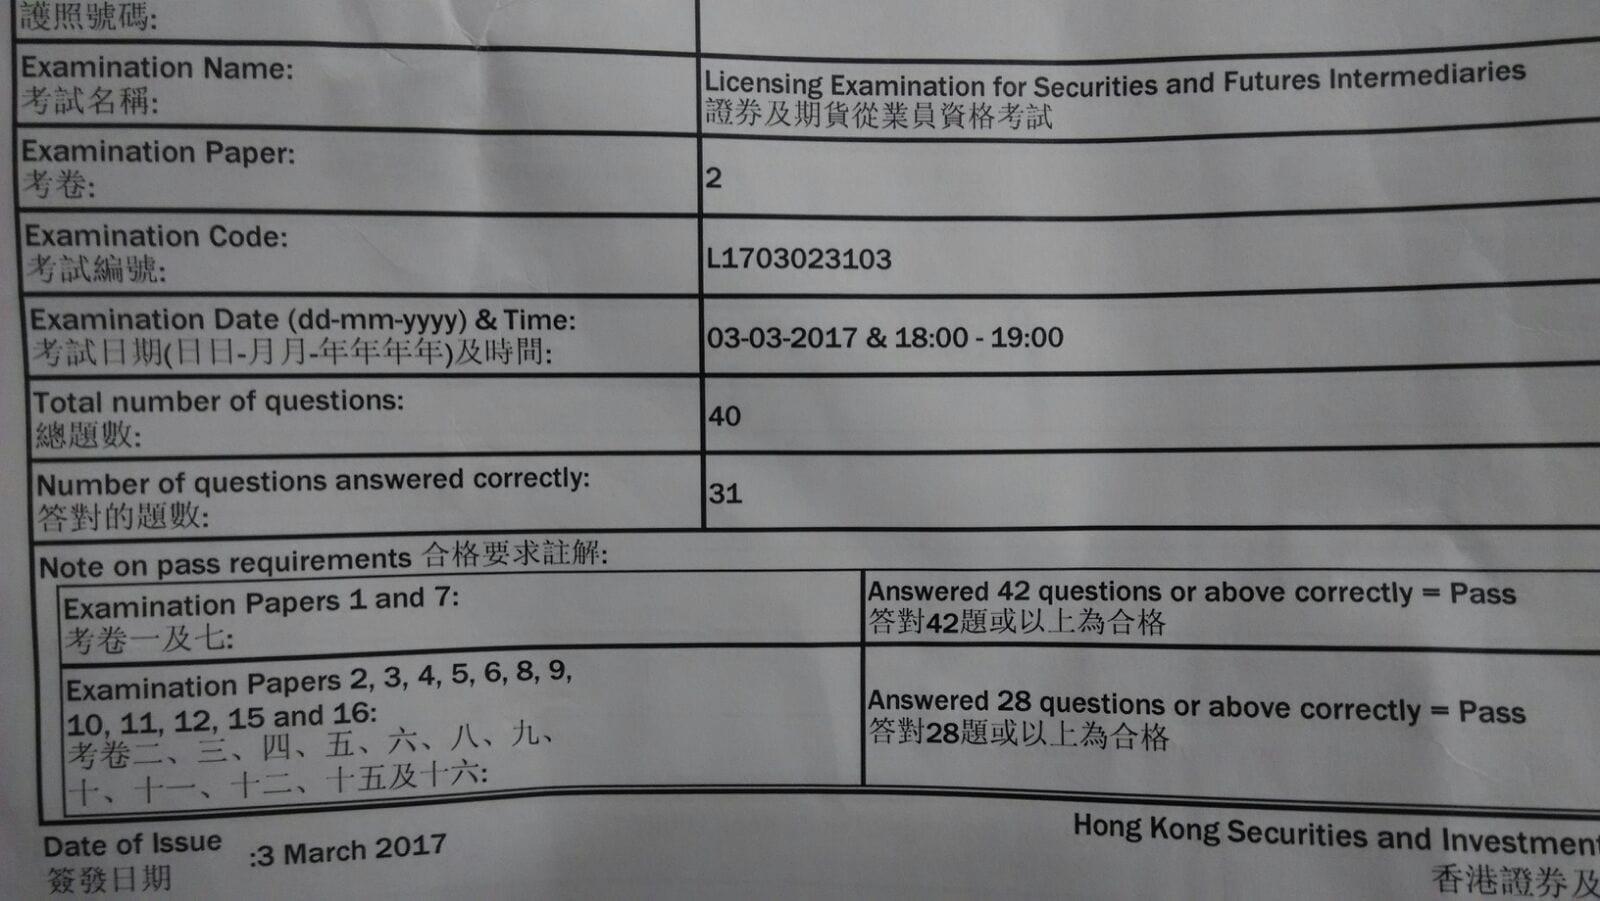 CHL 3/3/2017 LE Paper 2 證券期貨從業員資格考試卷二